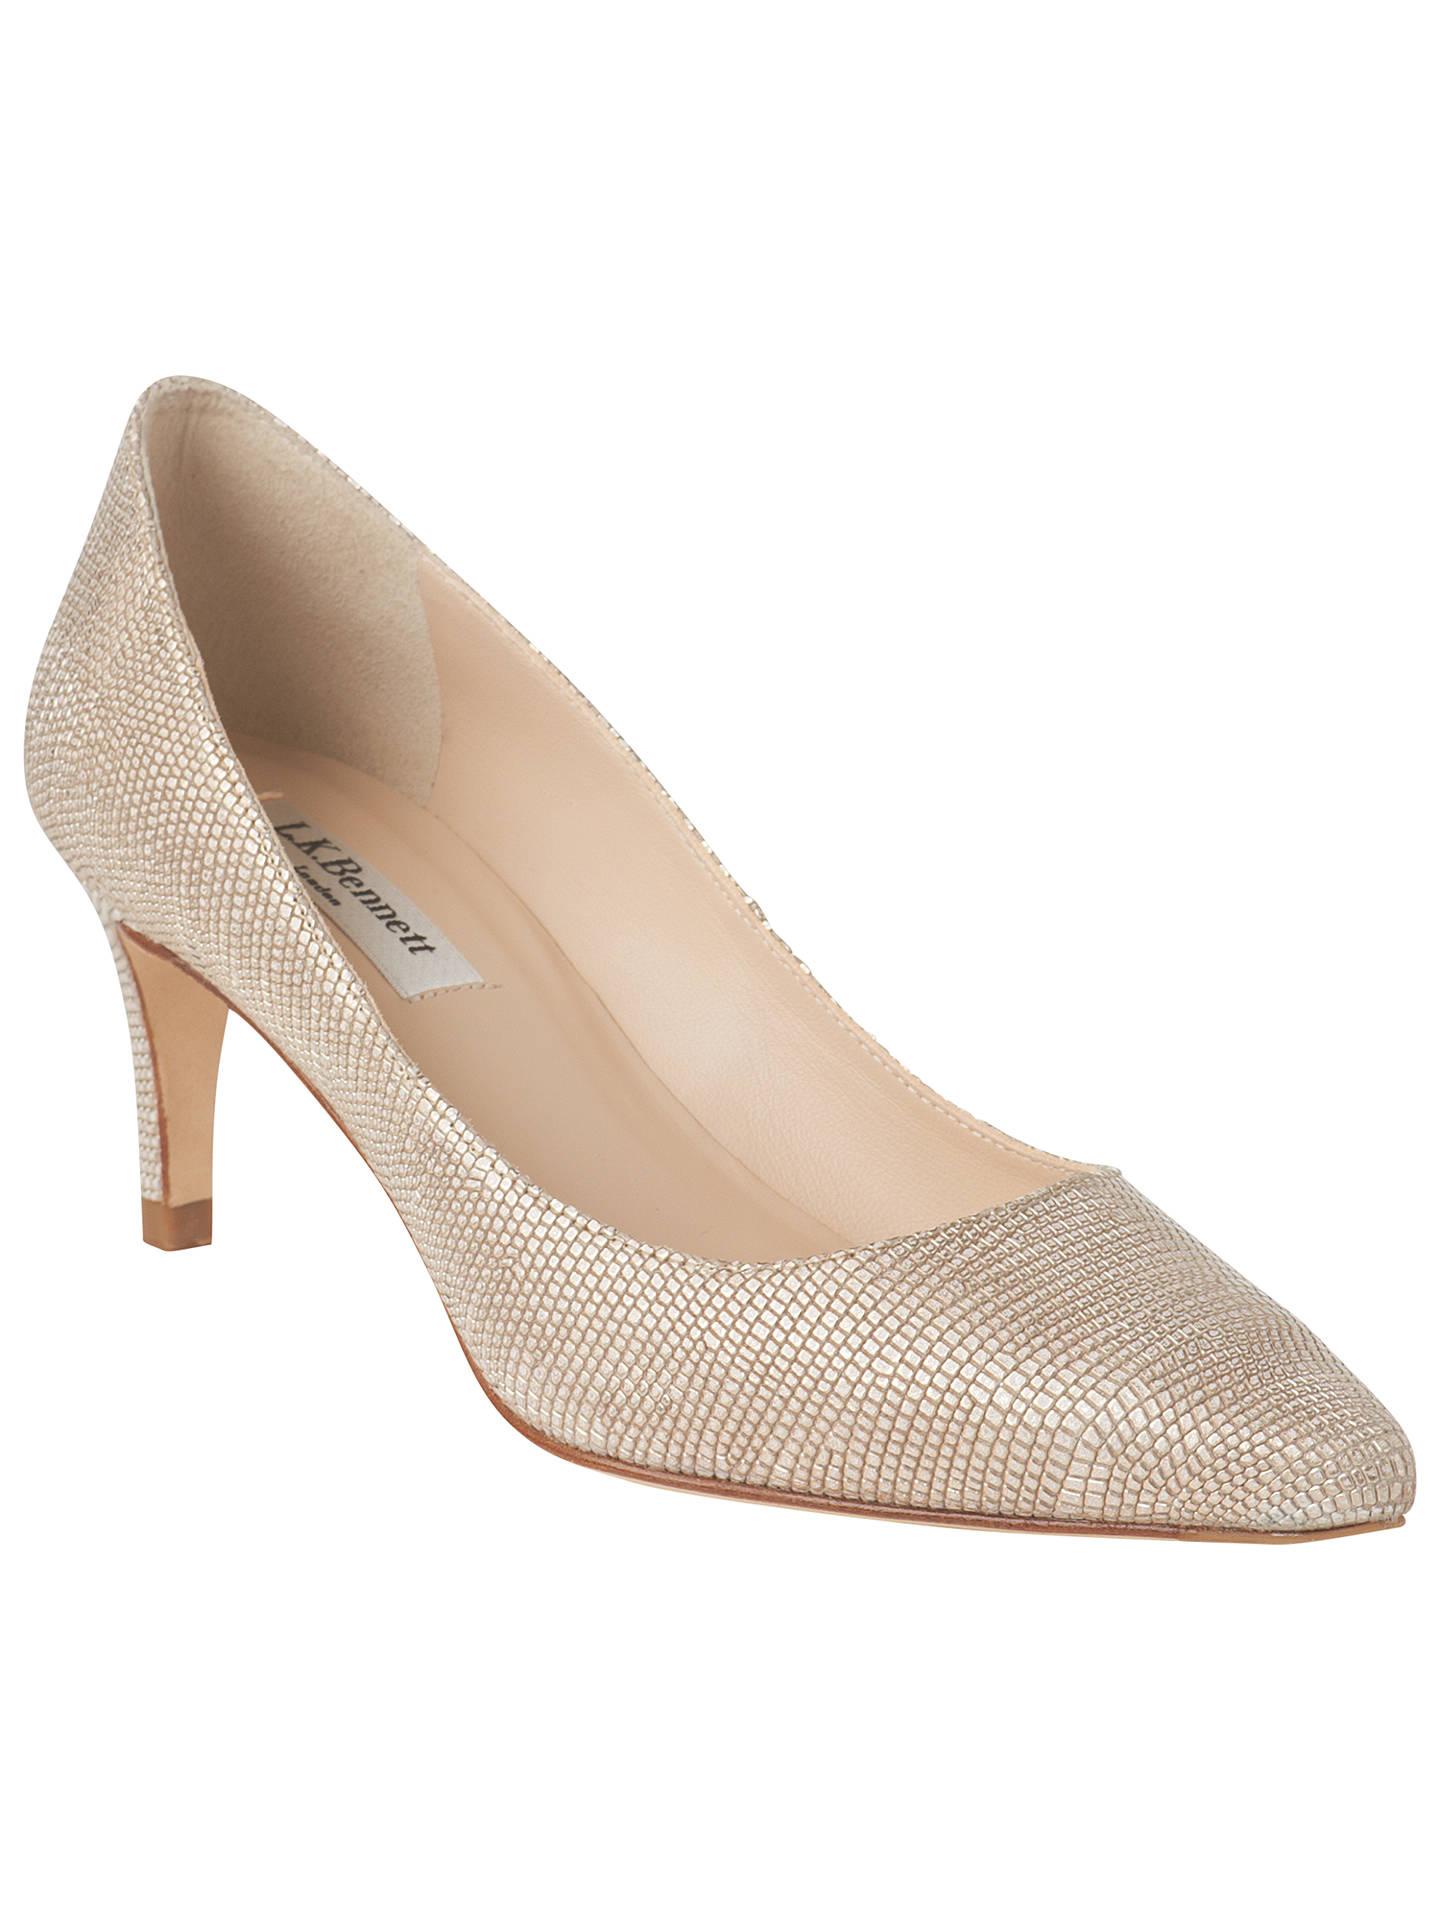 4c9cbcd00f Buy L.K. Bennett Florida Pointed Toe Court Shoes, Platinum Blush, 2 Online  at johnlewis ...